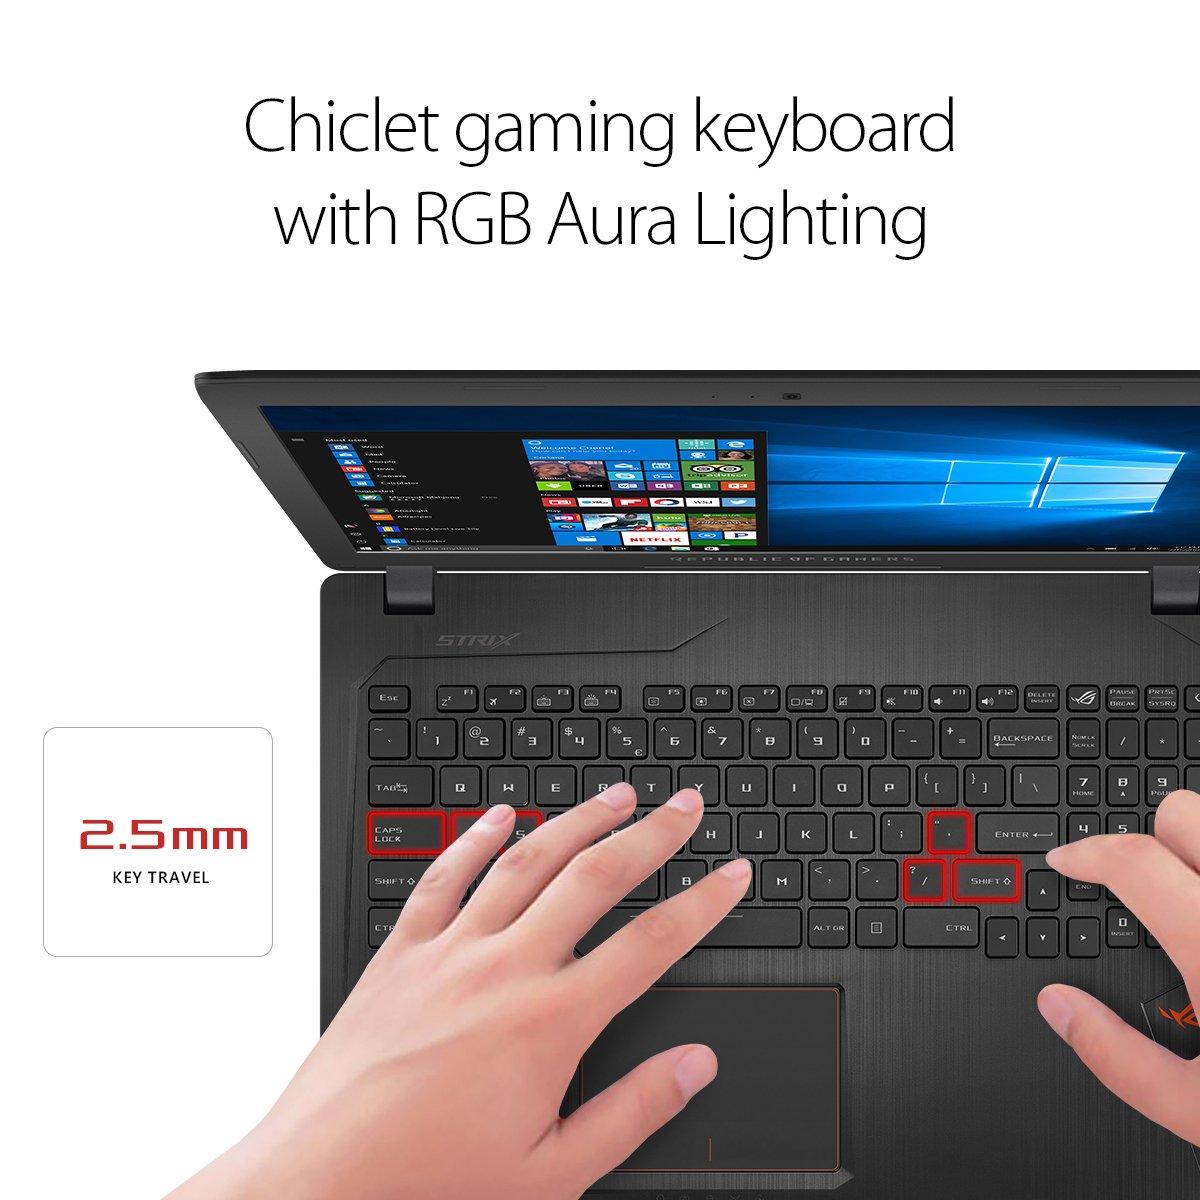 Laptops Asus Rog Strix Gl553vd 156 Gaming Laptop Gl553 Ve Nvidia Gtx 1050 4gb Intel Core I7 7700hq 16gb Ddr4 1tb 7200rpm Hdd Rgb Keyboard